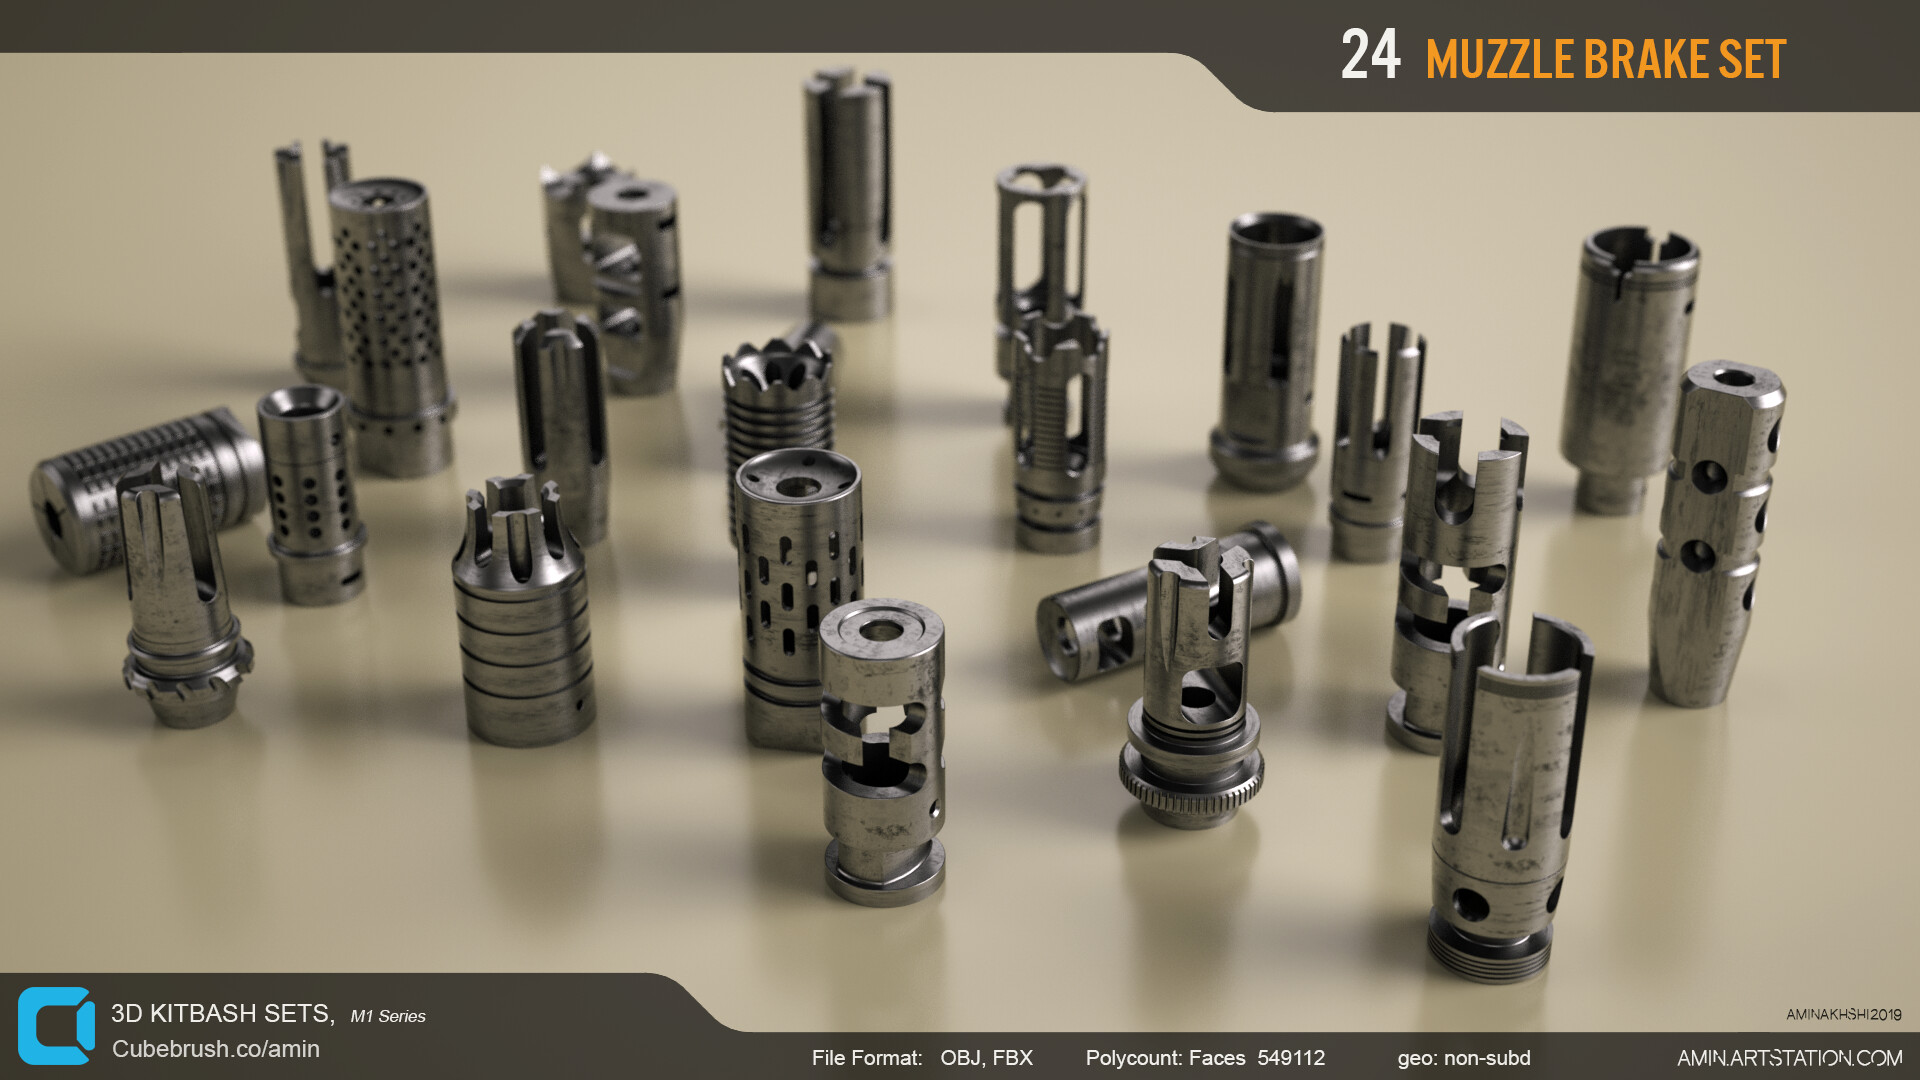 Amin akhshi 002 muzzle brakes set